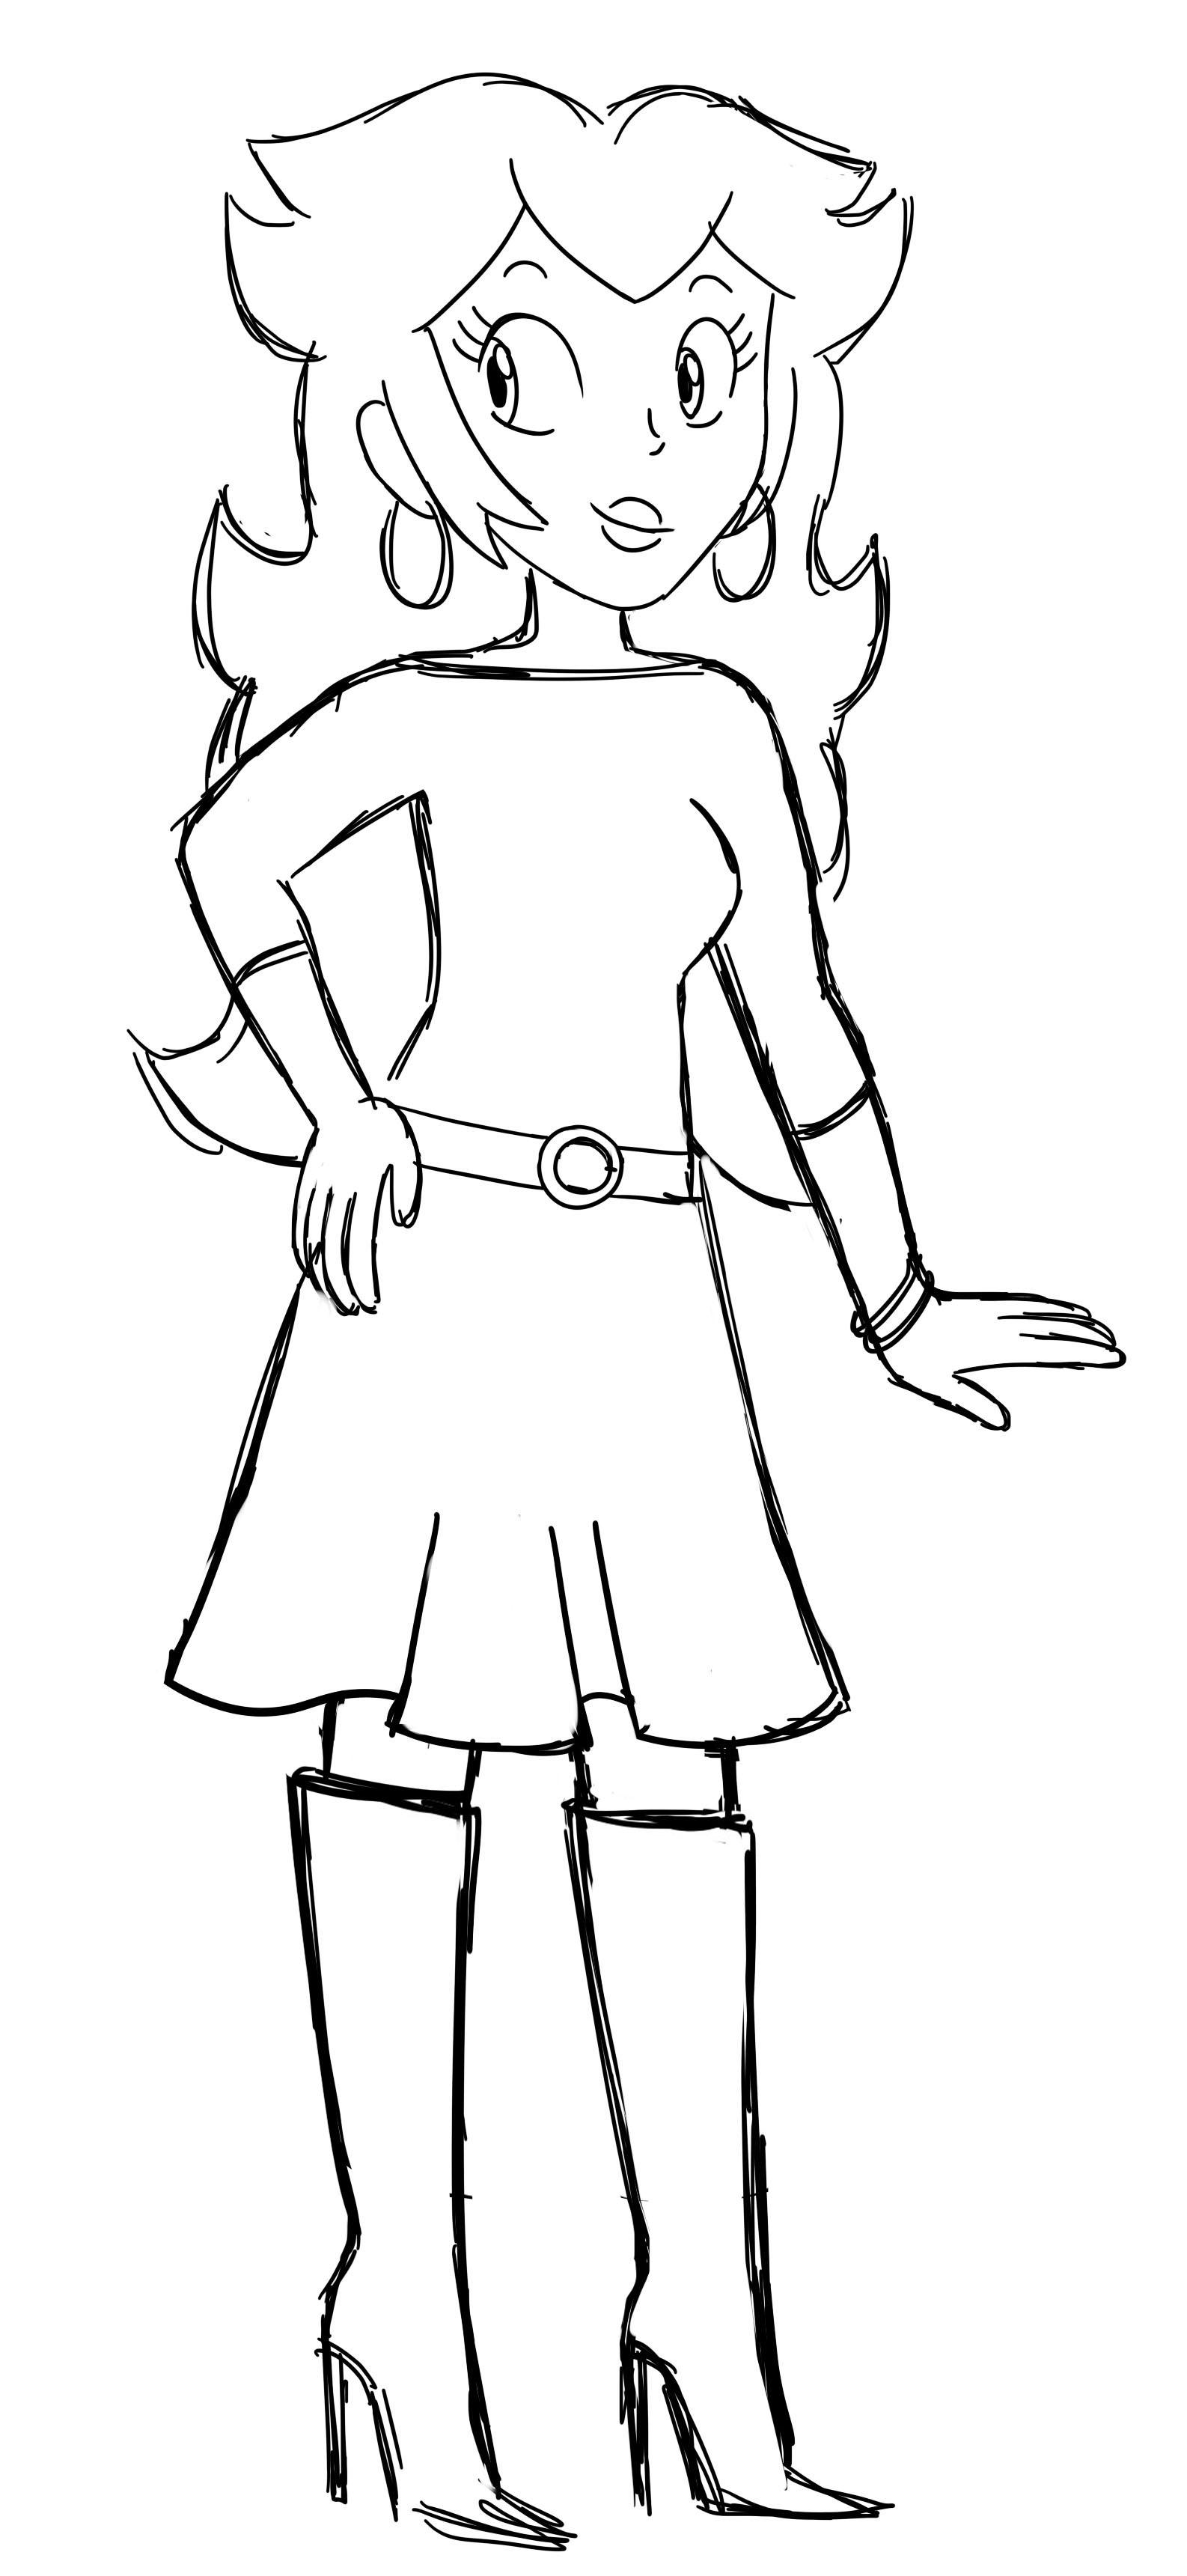 Princess Peach - Ralph Lauren Style (Sketch)